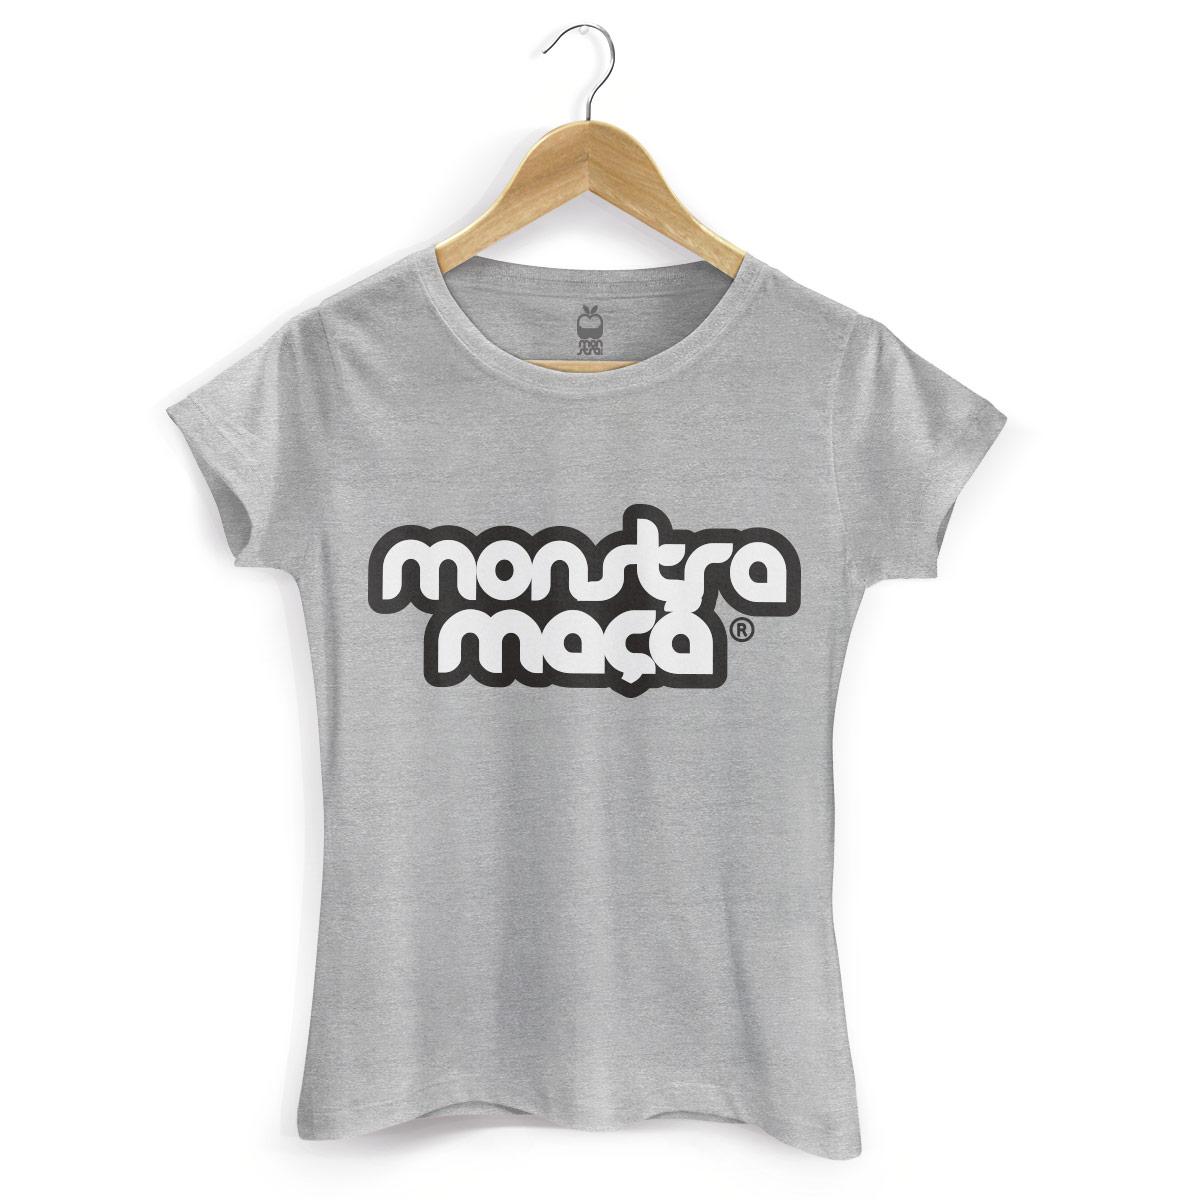 Camiseta Feminina Monstra Maçã Logo